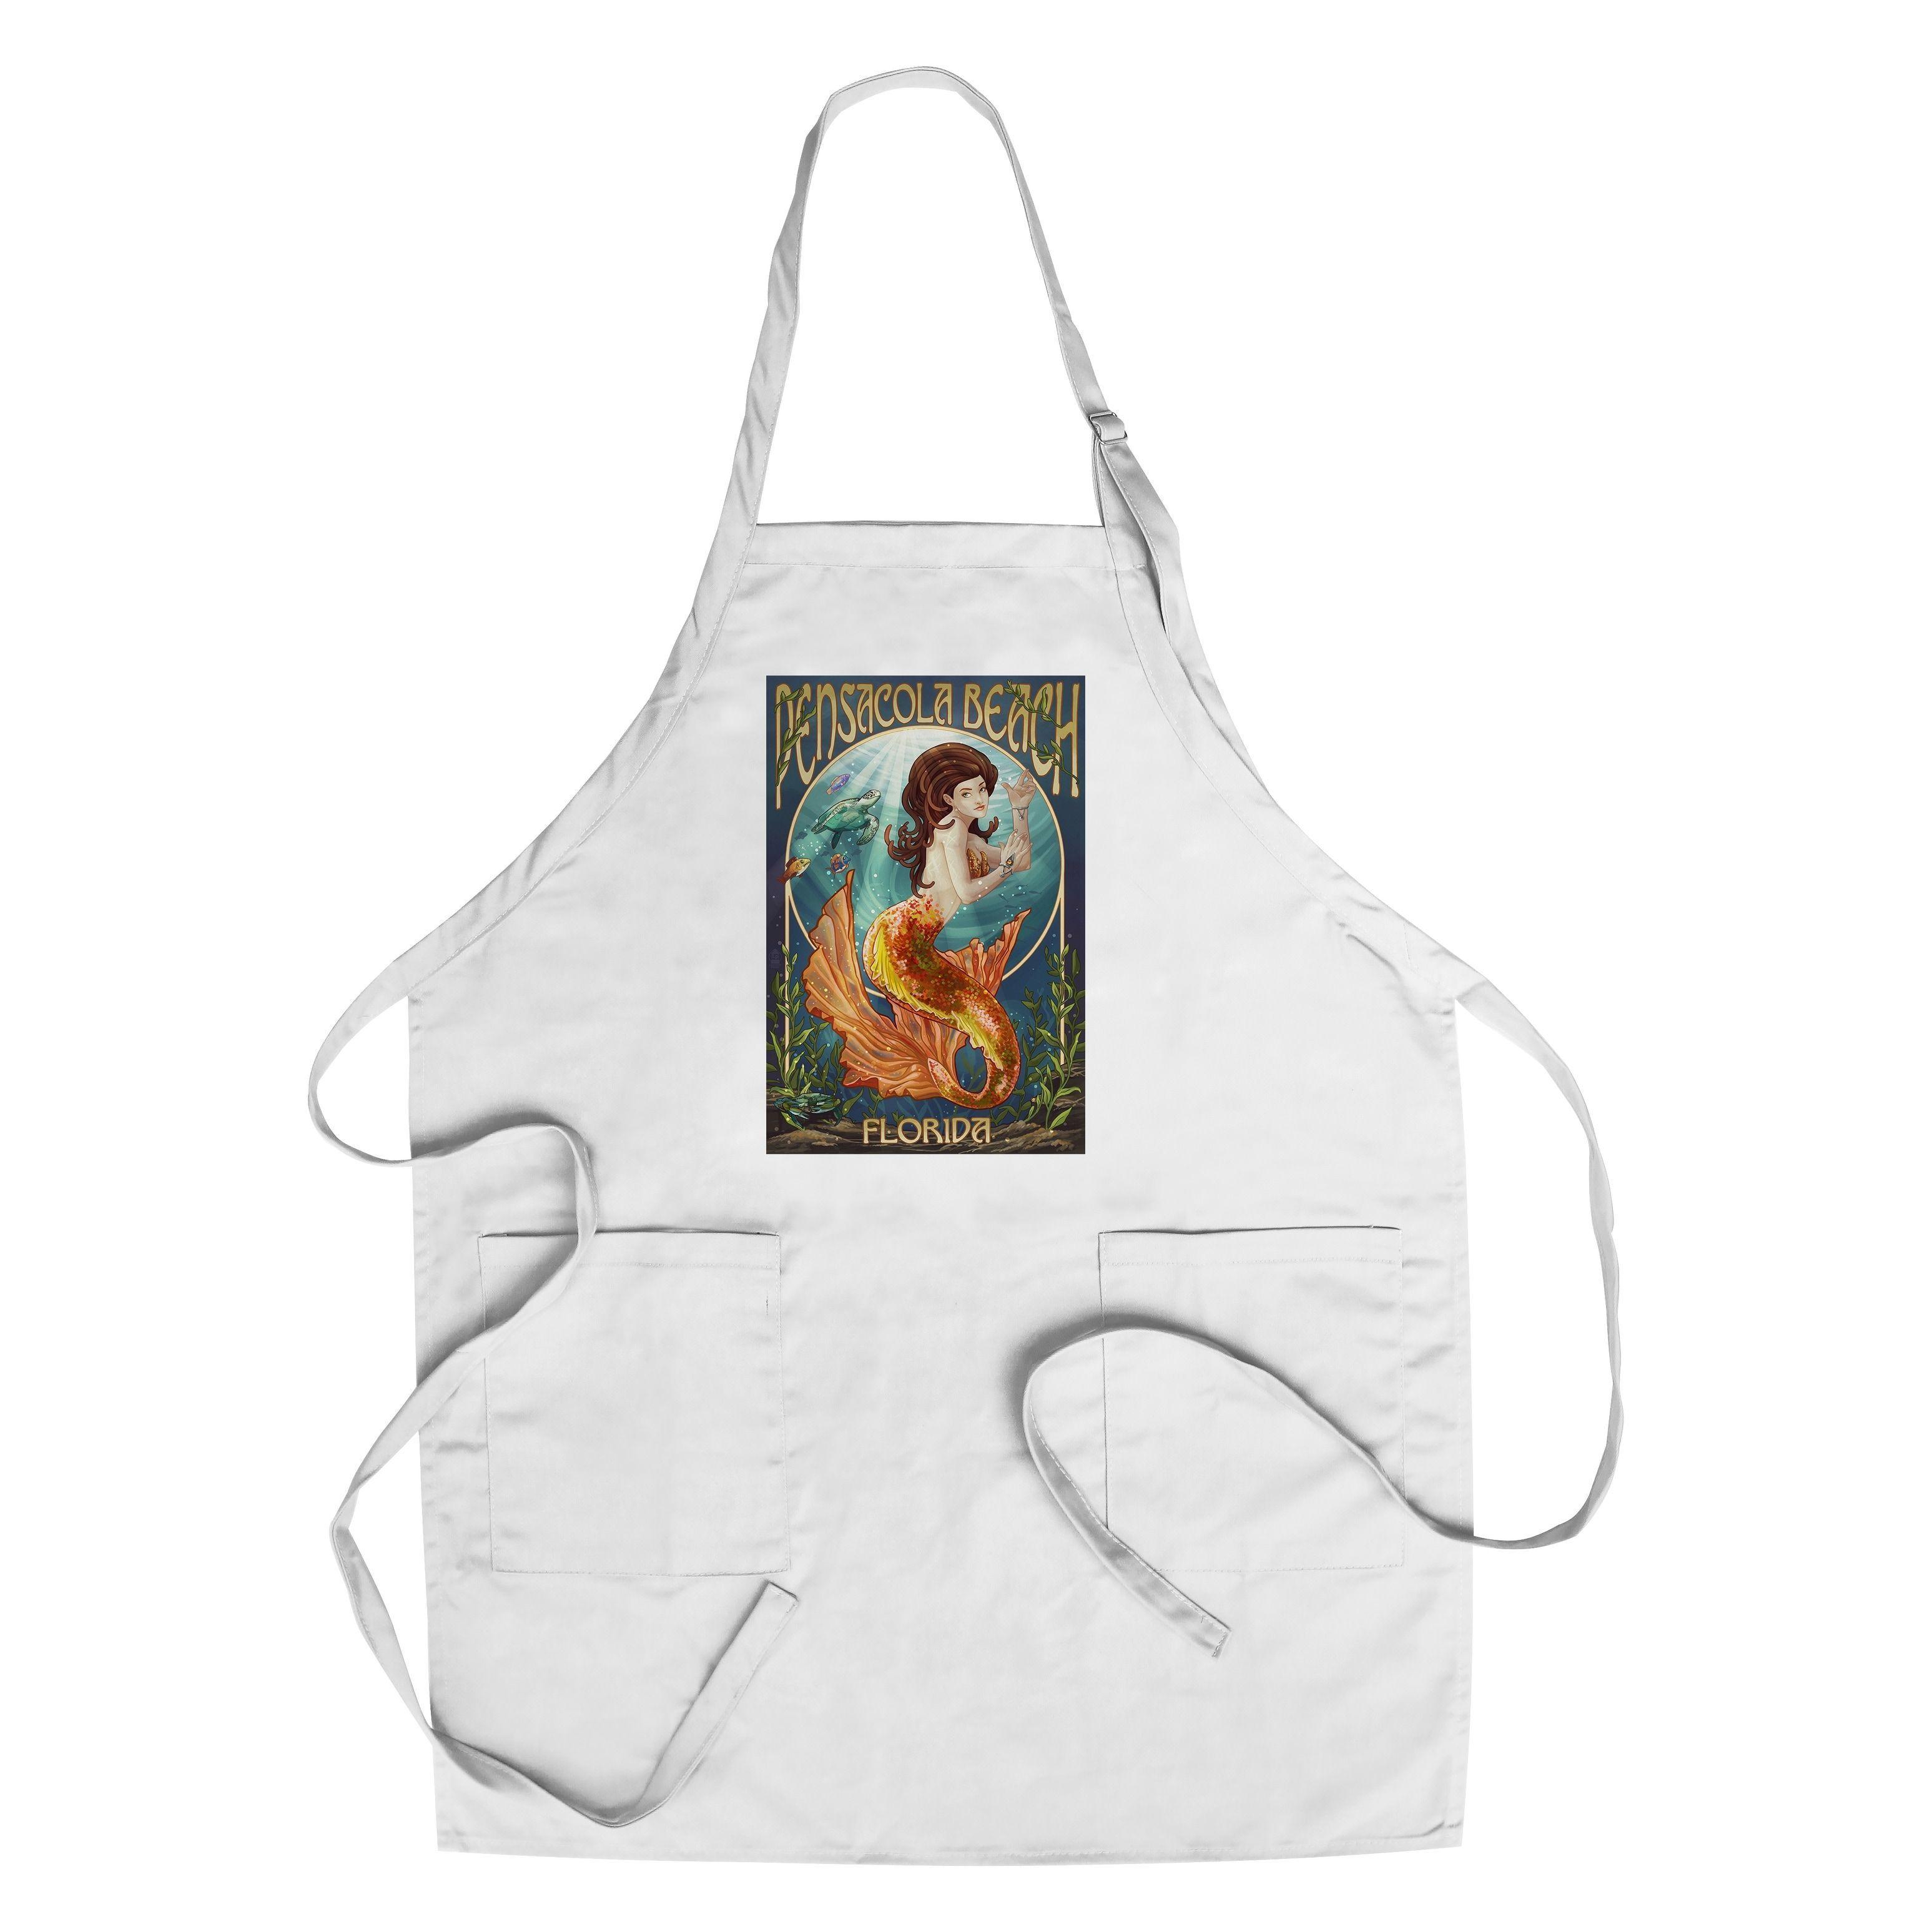 Pensacola Beach, Florida - Mermaid - LP Artwork (Cotton/Polyester ...